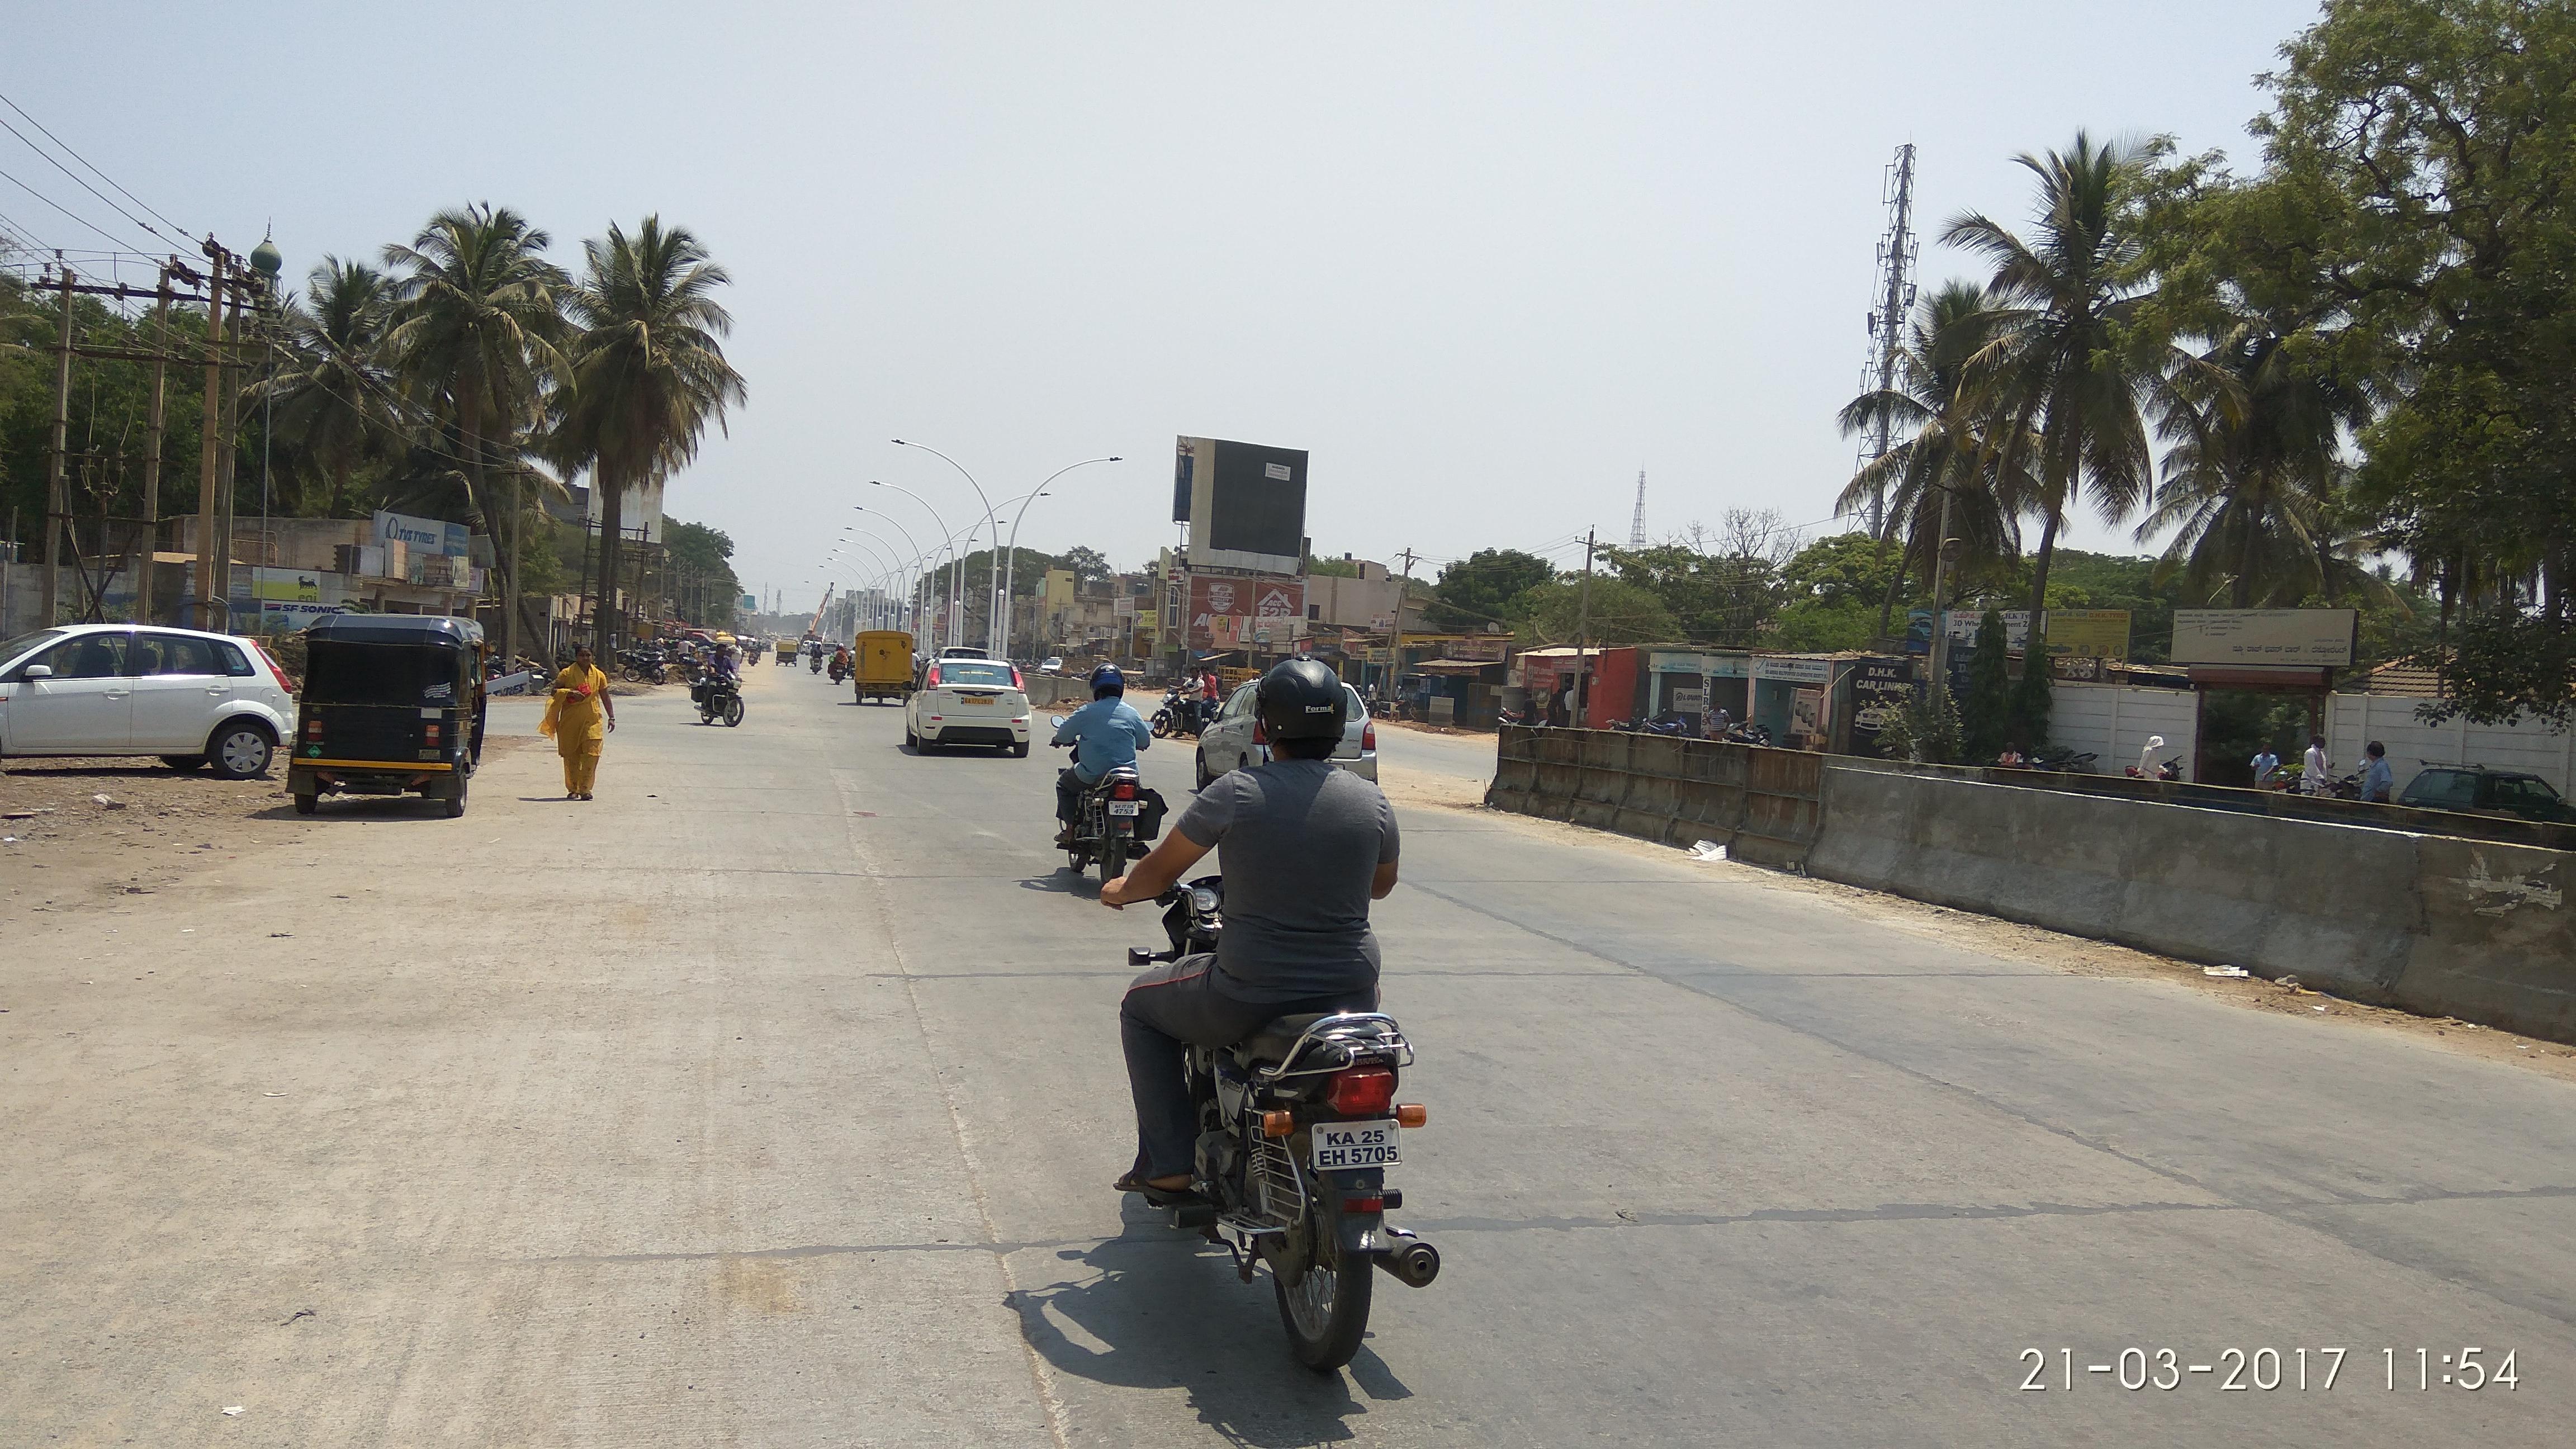 Vinoba Nagar 3rd Cross, P.B Rd, Davanagere